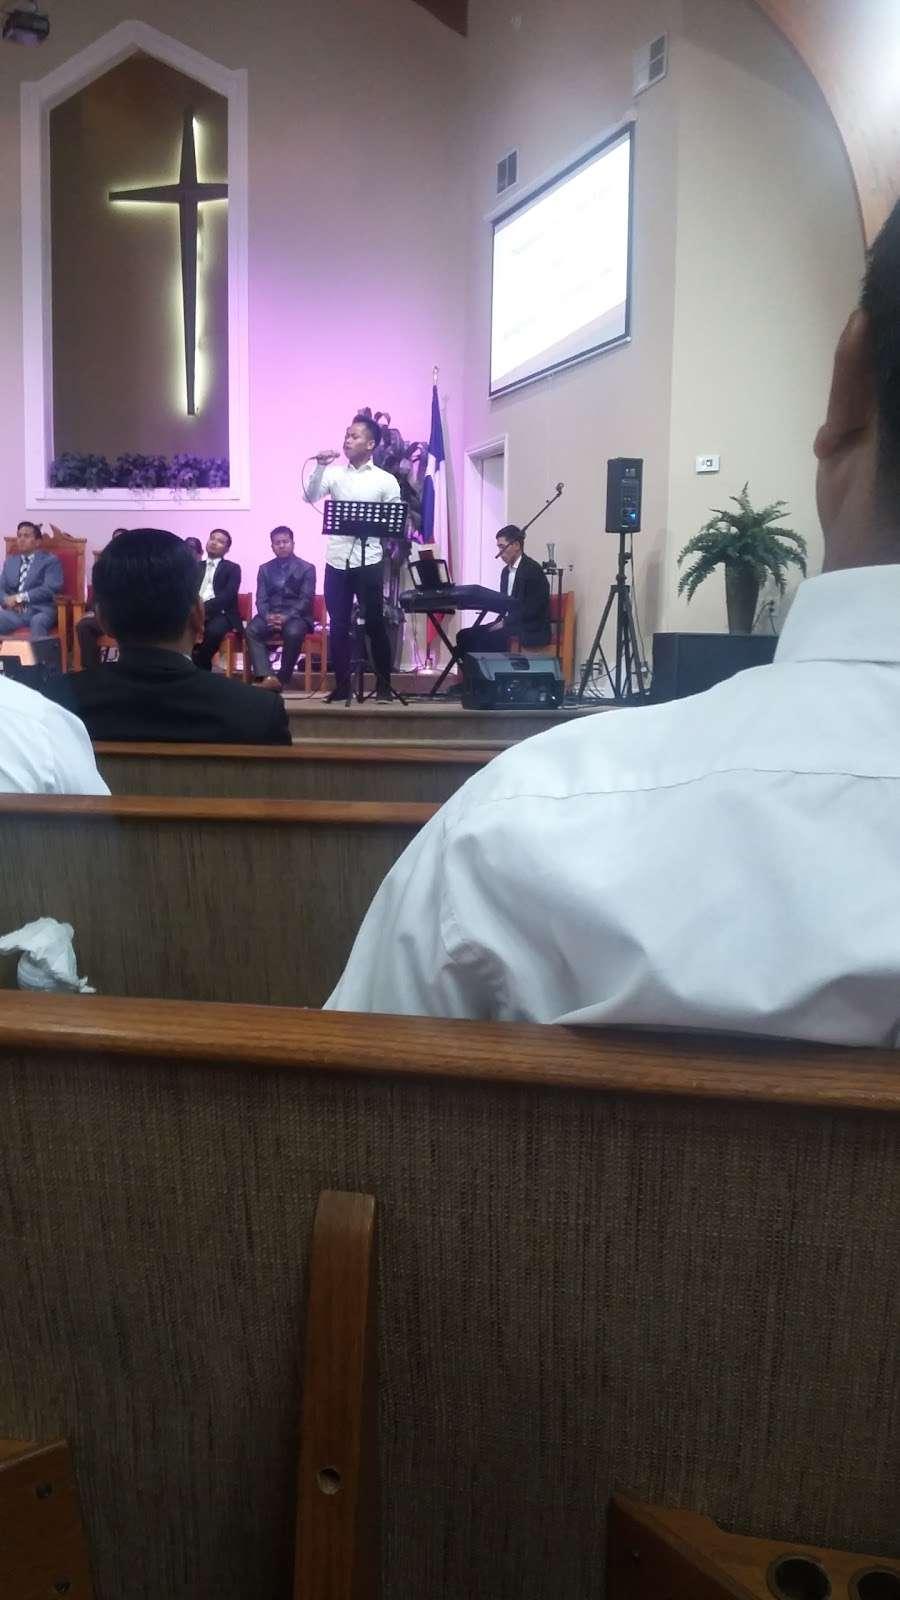 Chin Rivival Church - church    Photo 1 of 4   Address: 1310 E Grauwyler Rd, Irving, TX 75061, USA